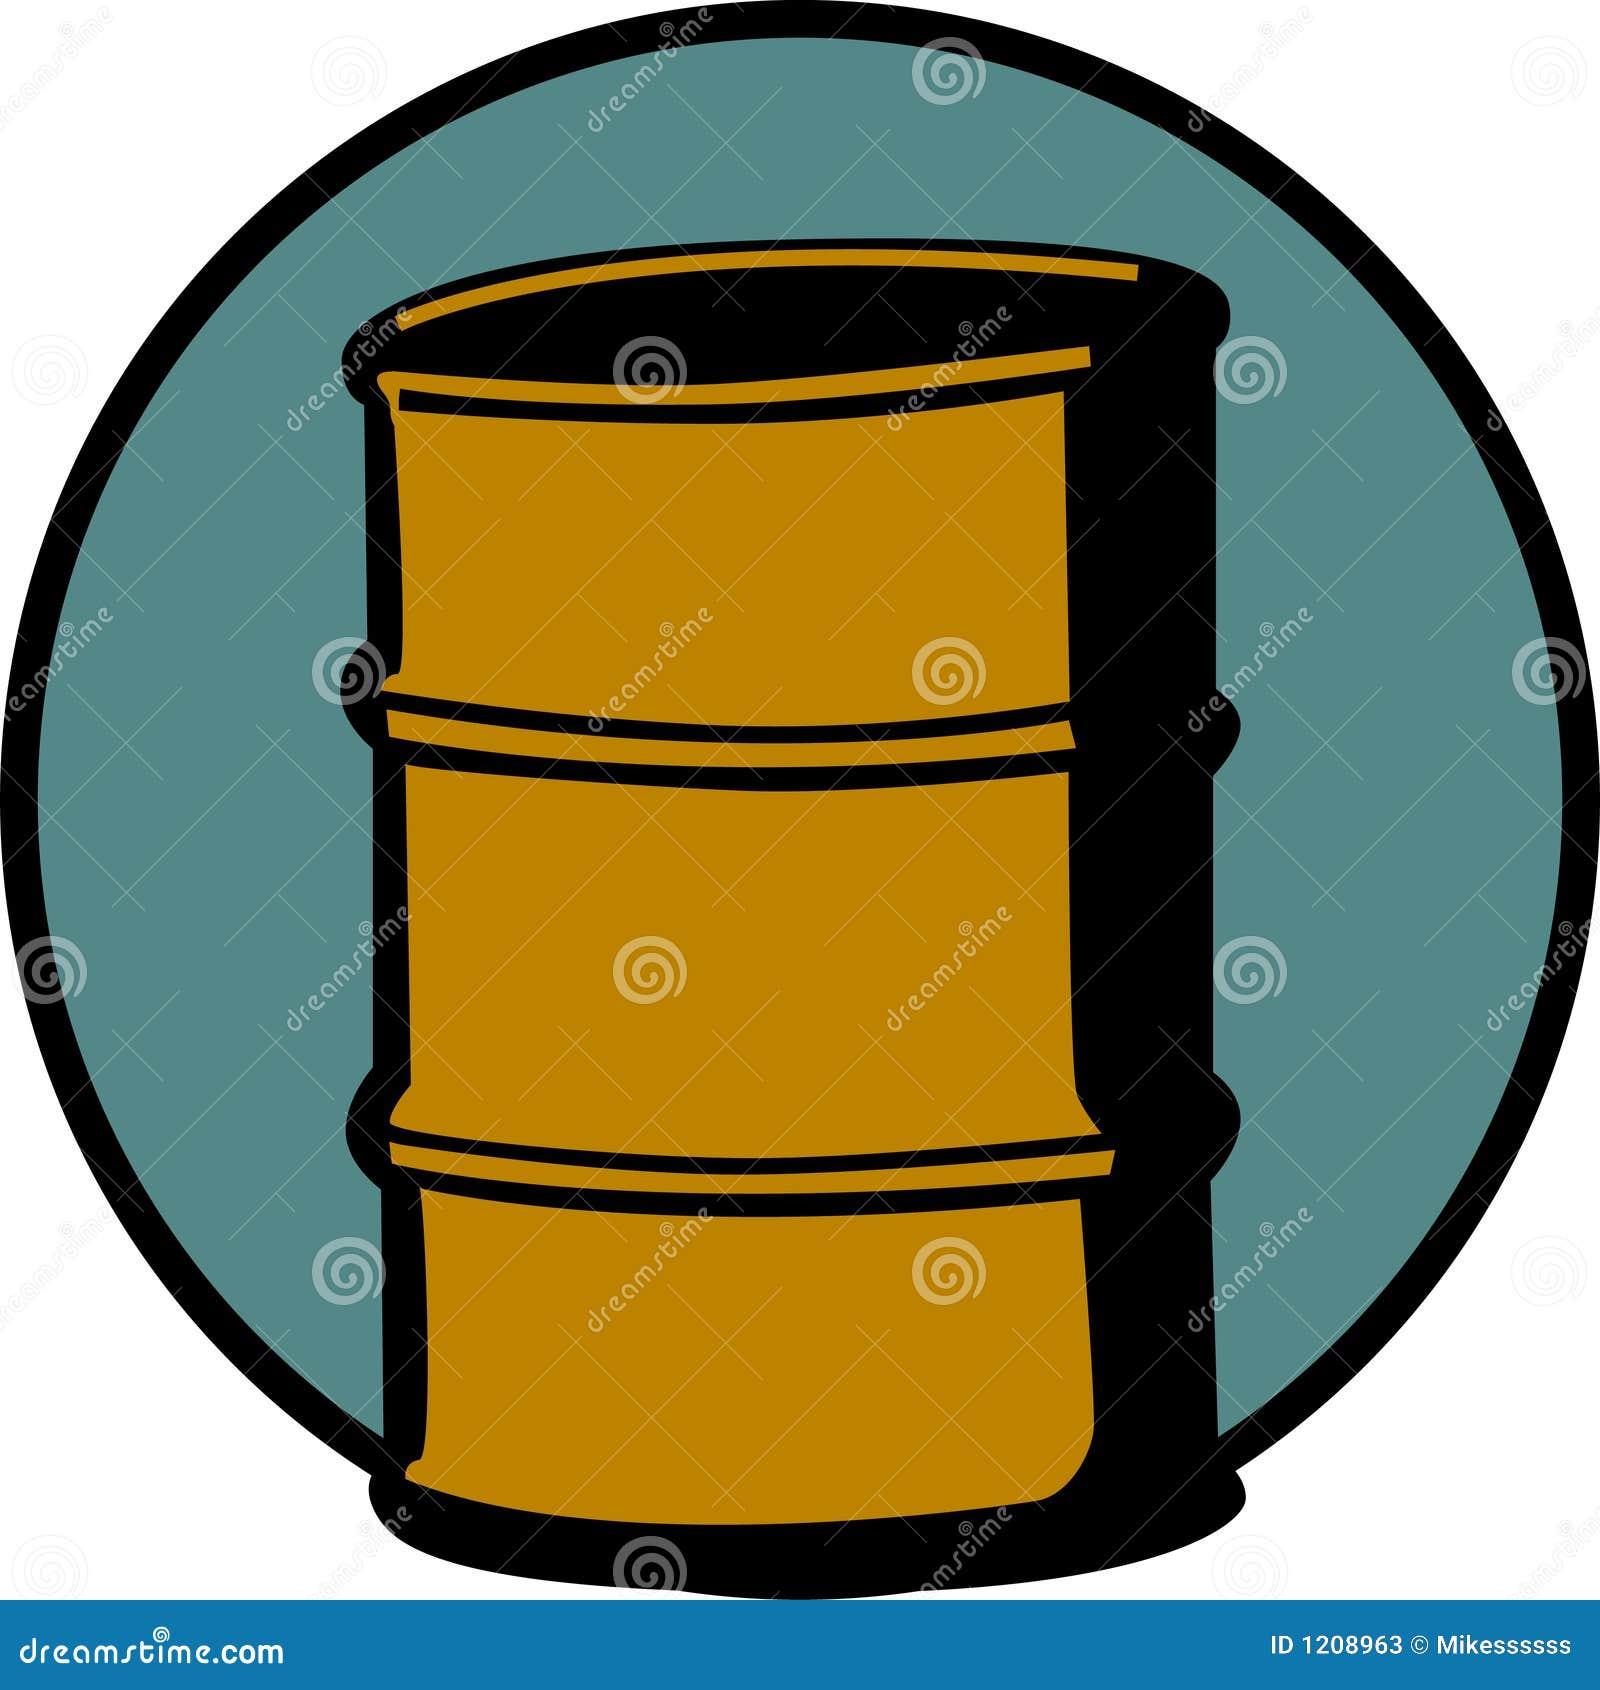 cask or metal barrel cointainer. Vector